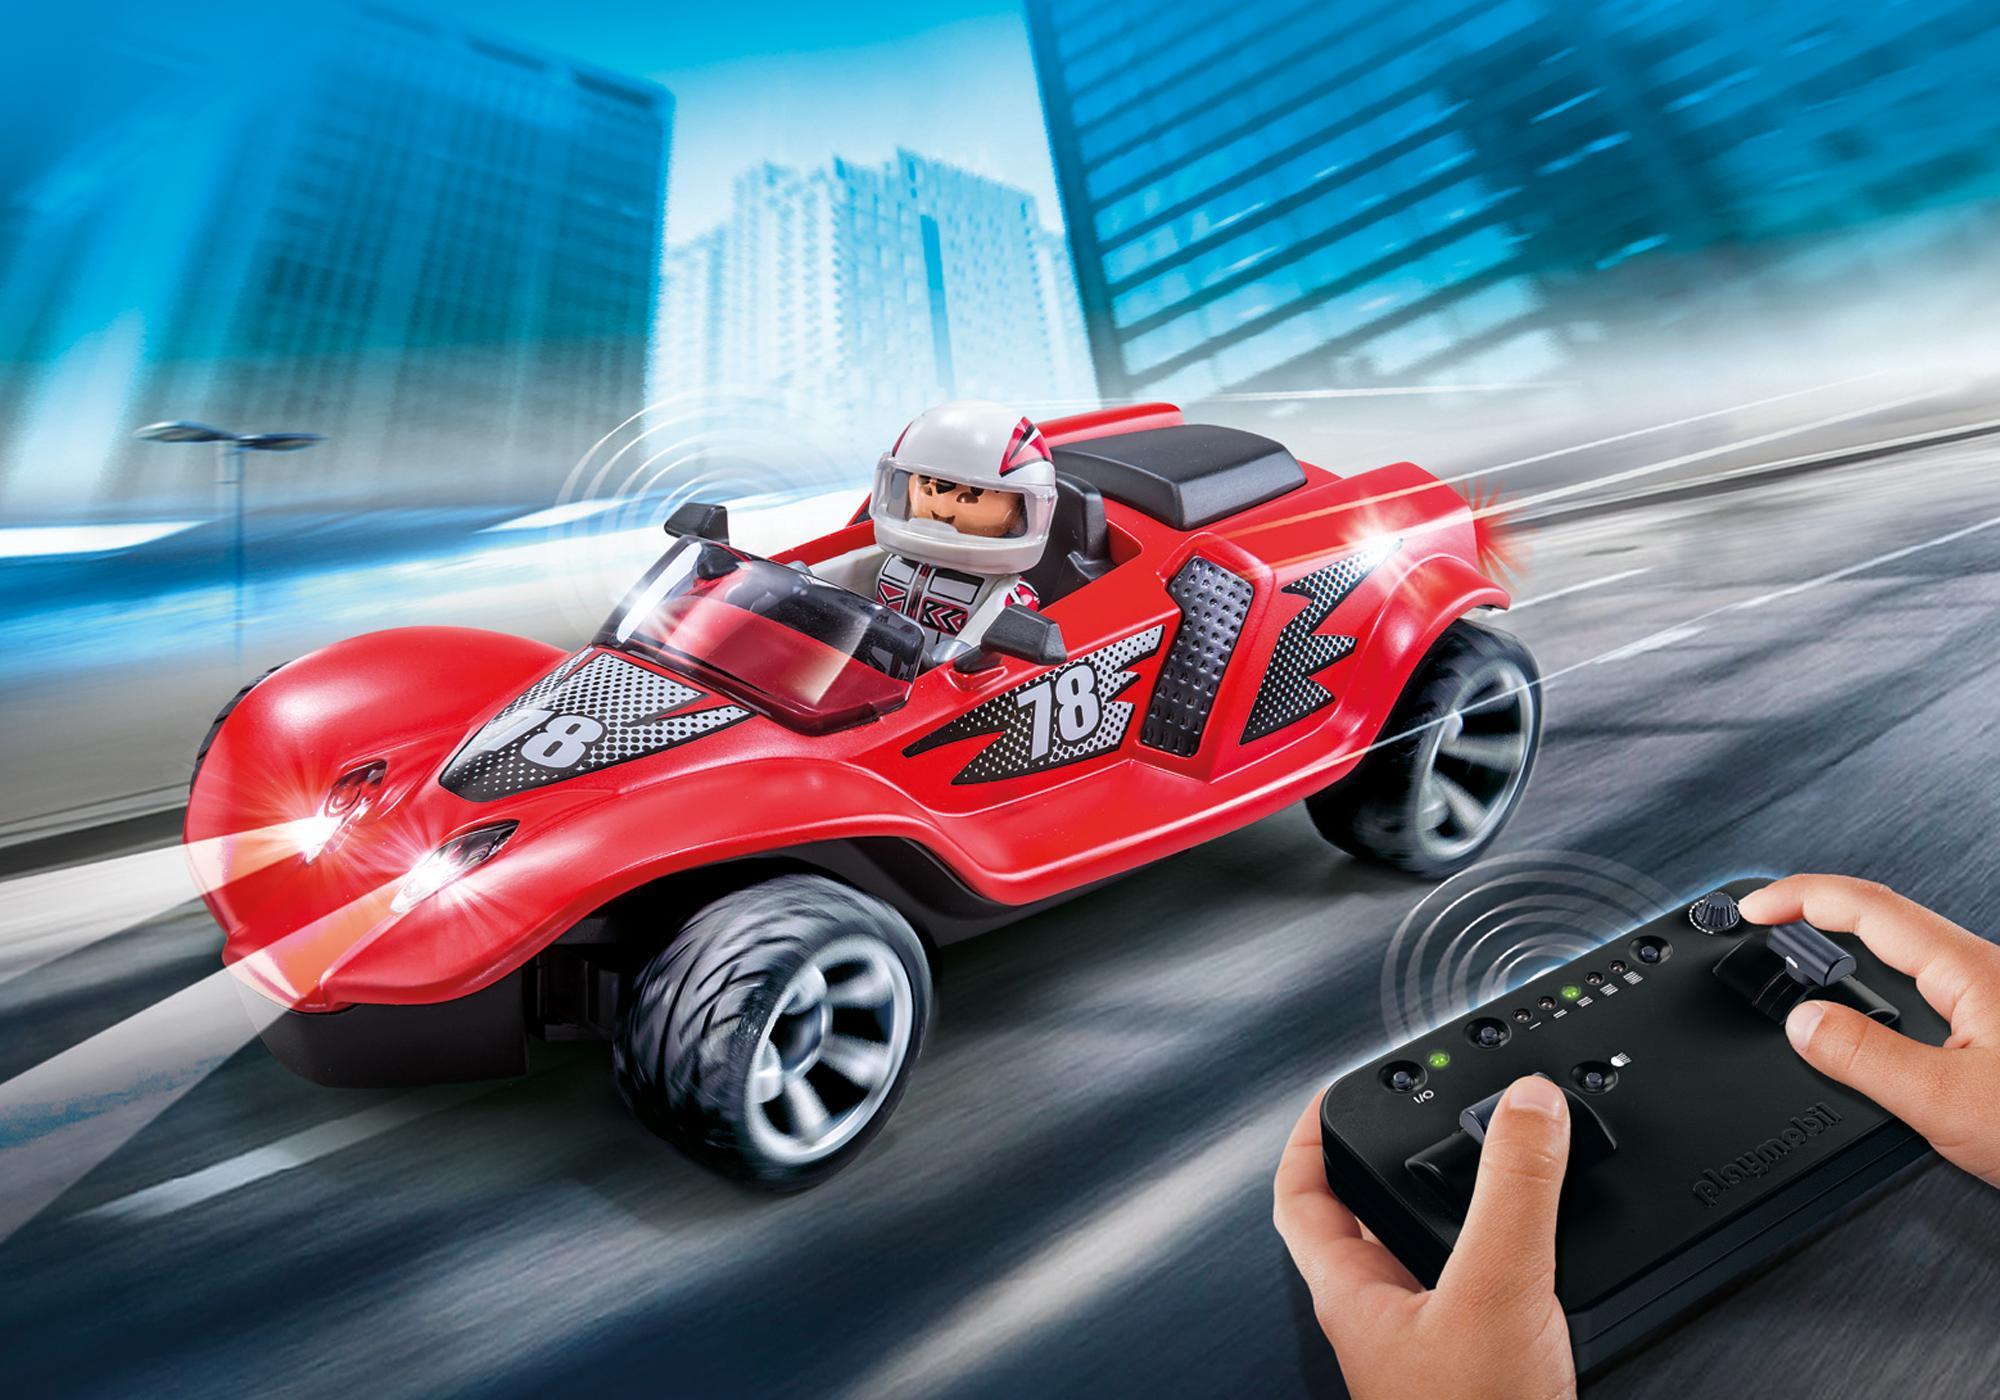 http://media.playmobil.com/i/playmobil/9090_product_detail/Voiture de course rouge radiocommandée